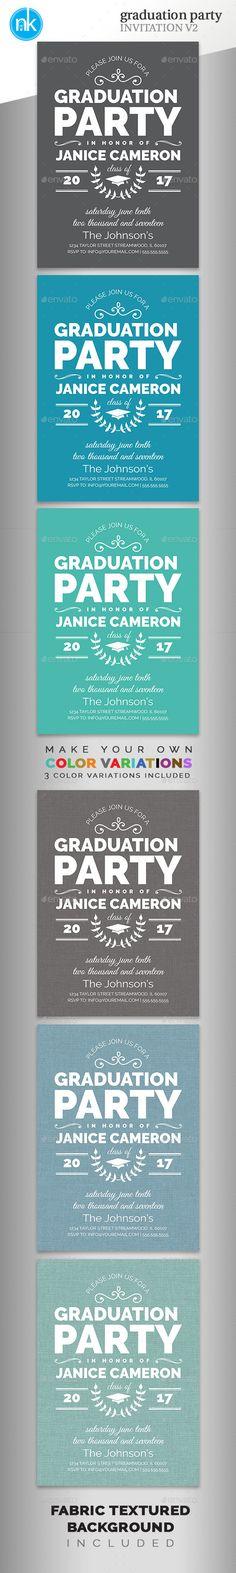 25+ Premium Birthday Party Invitation Templates u2013 PSD,Indesign,Word - birthday invitation card template photoshop